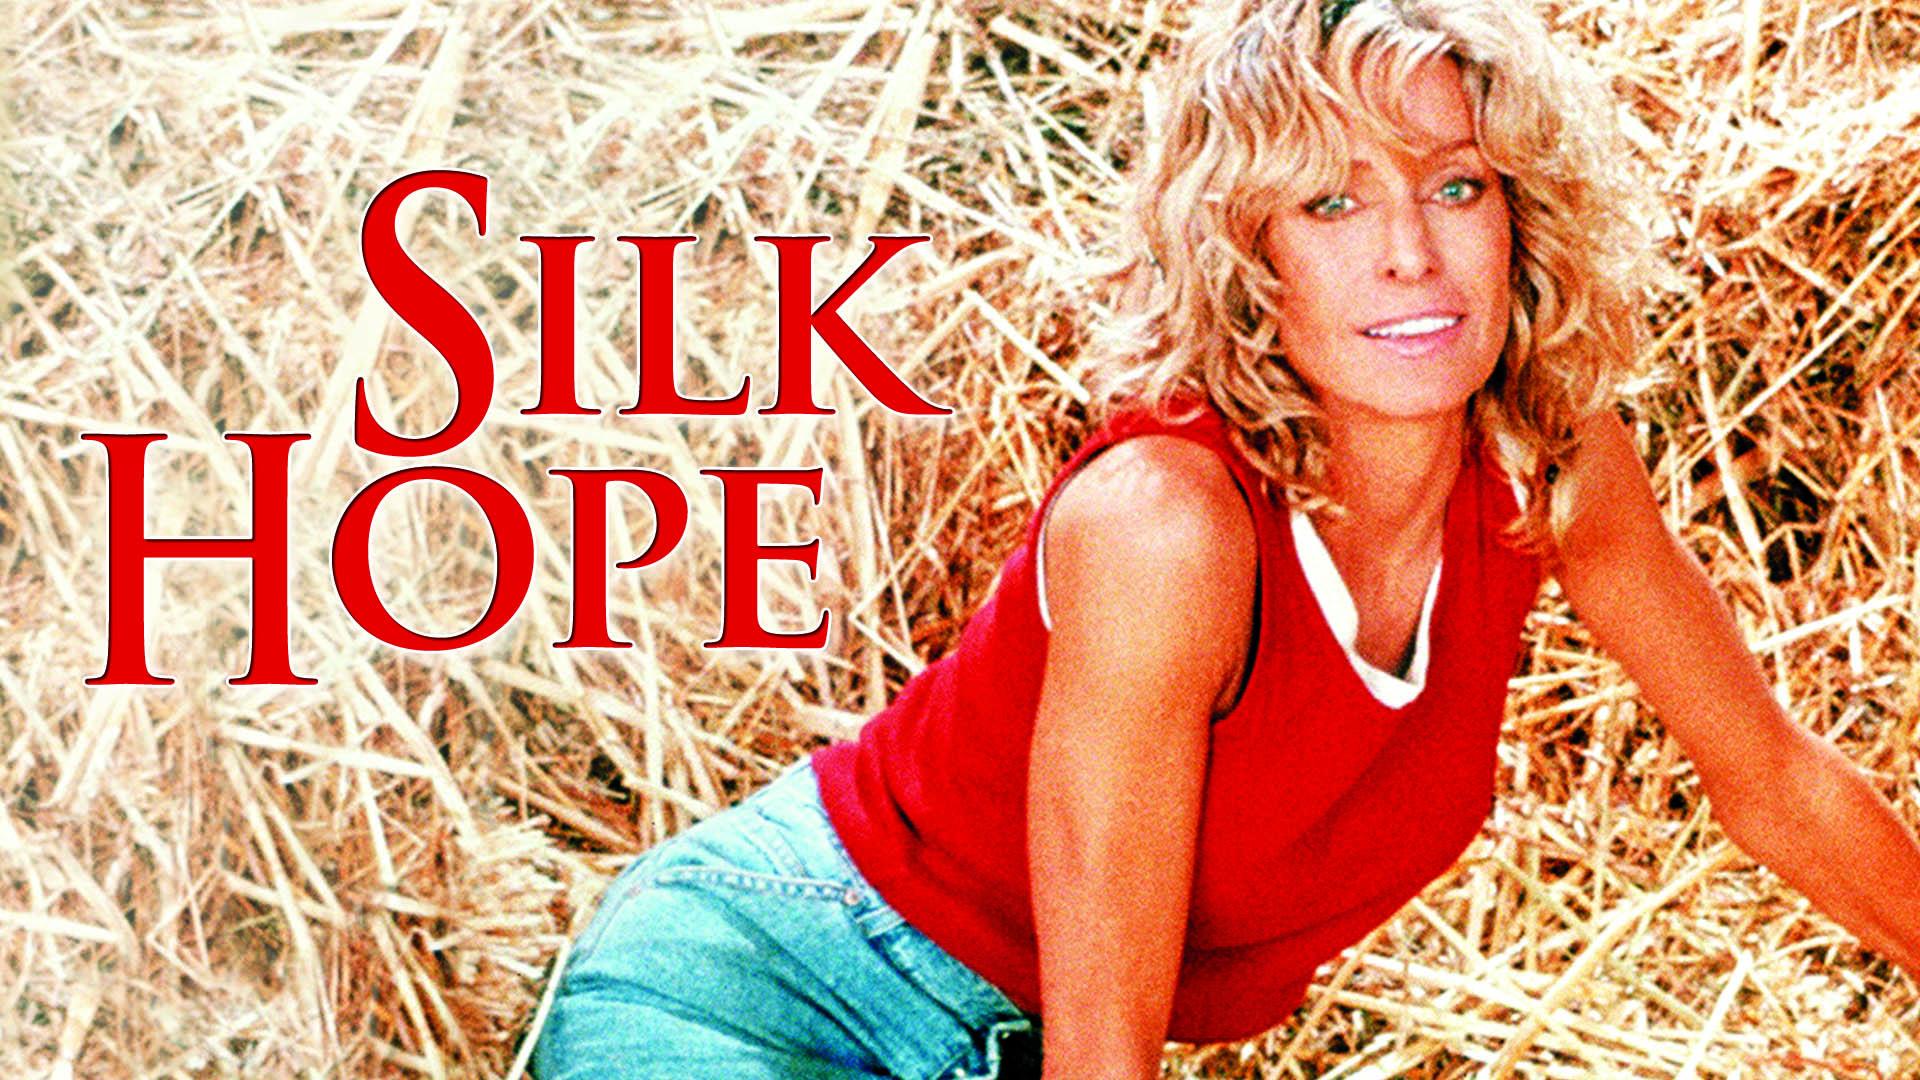 Silk Hope